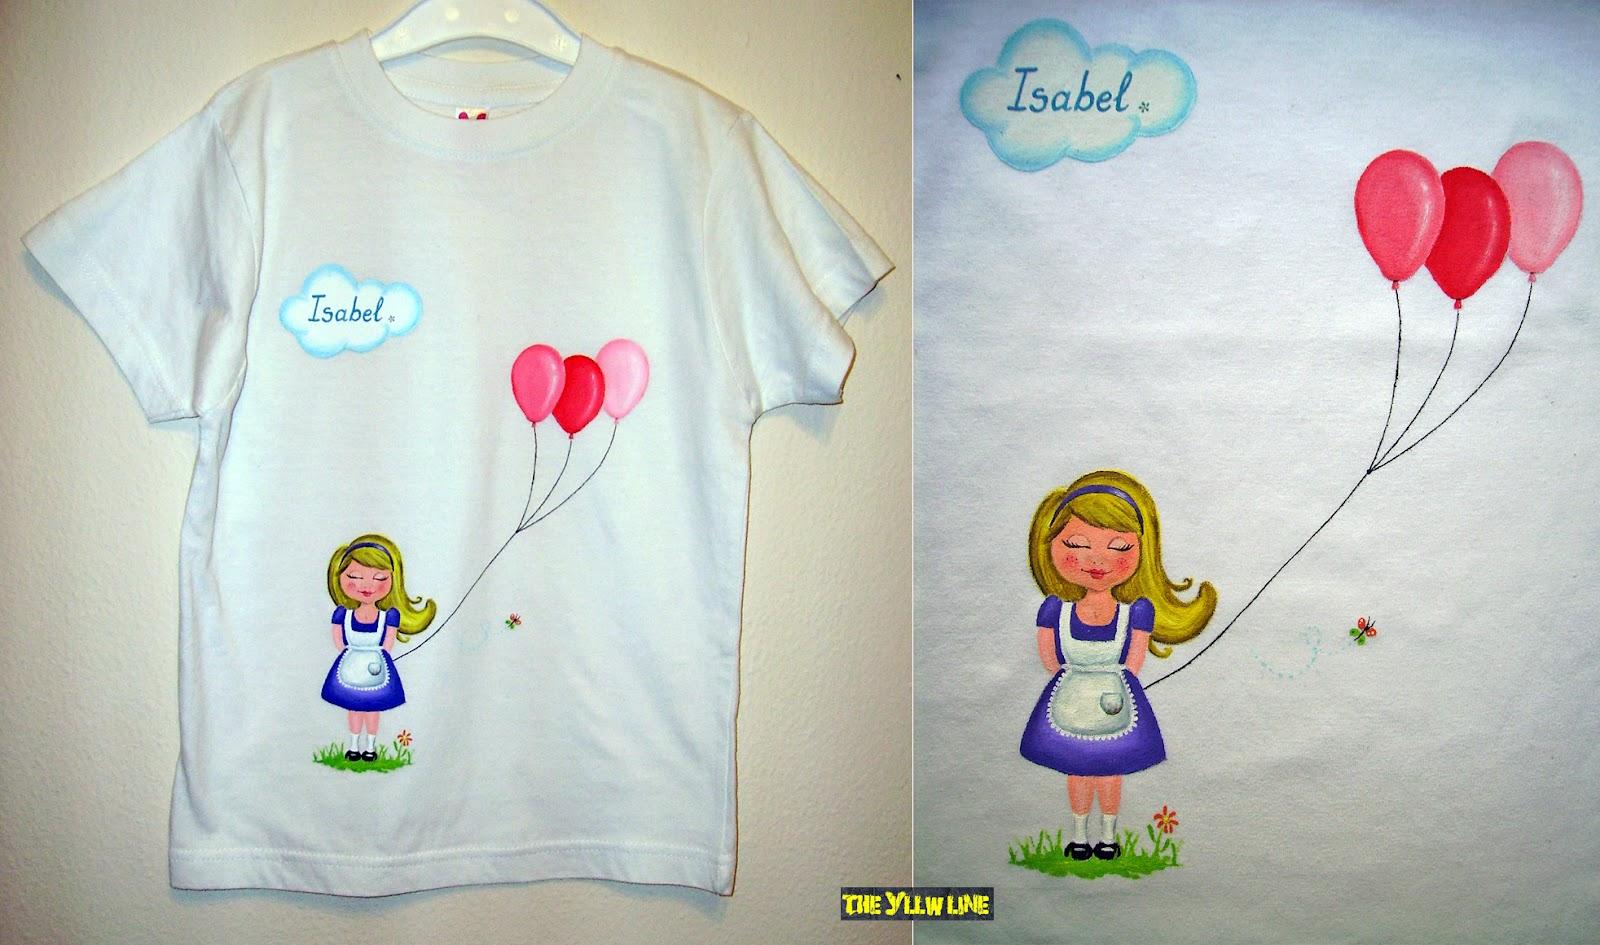 The yllw line mayo 2012 - Plantillas para pintar camisetas a mano ...